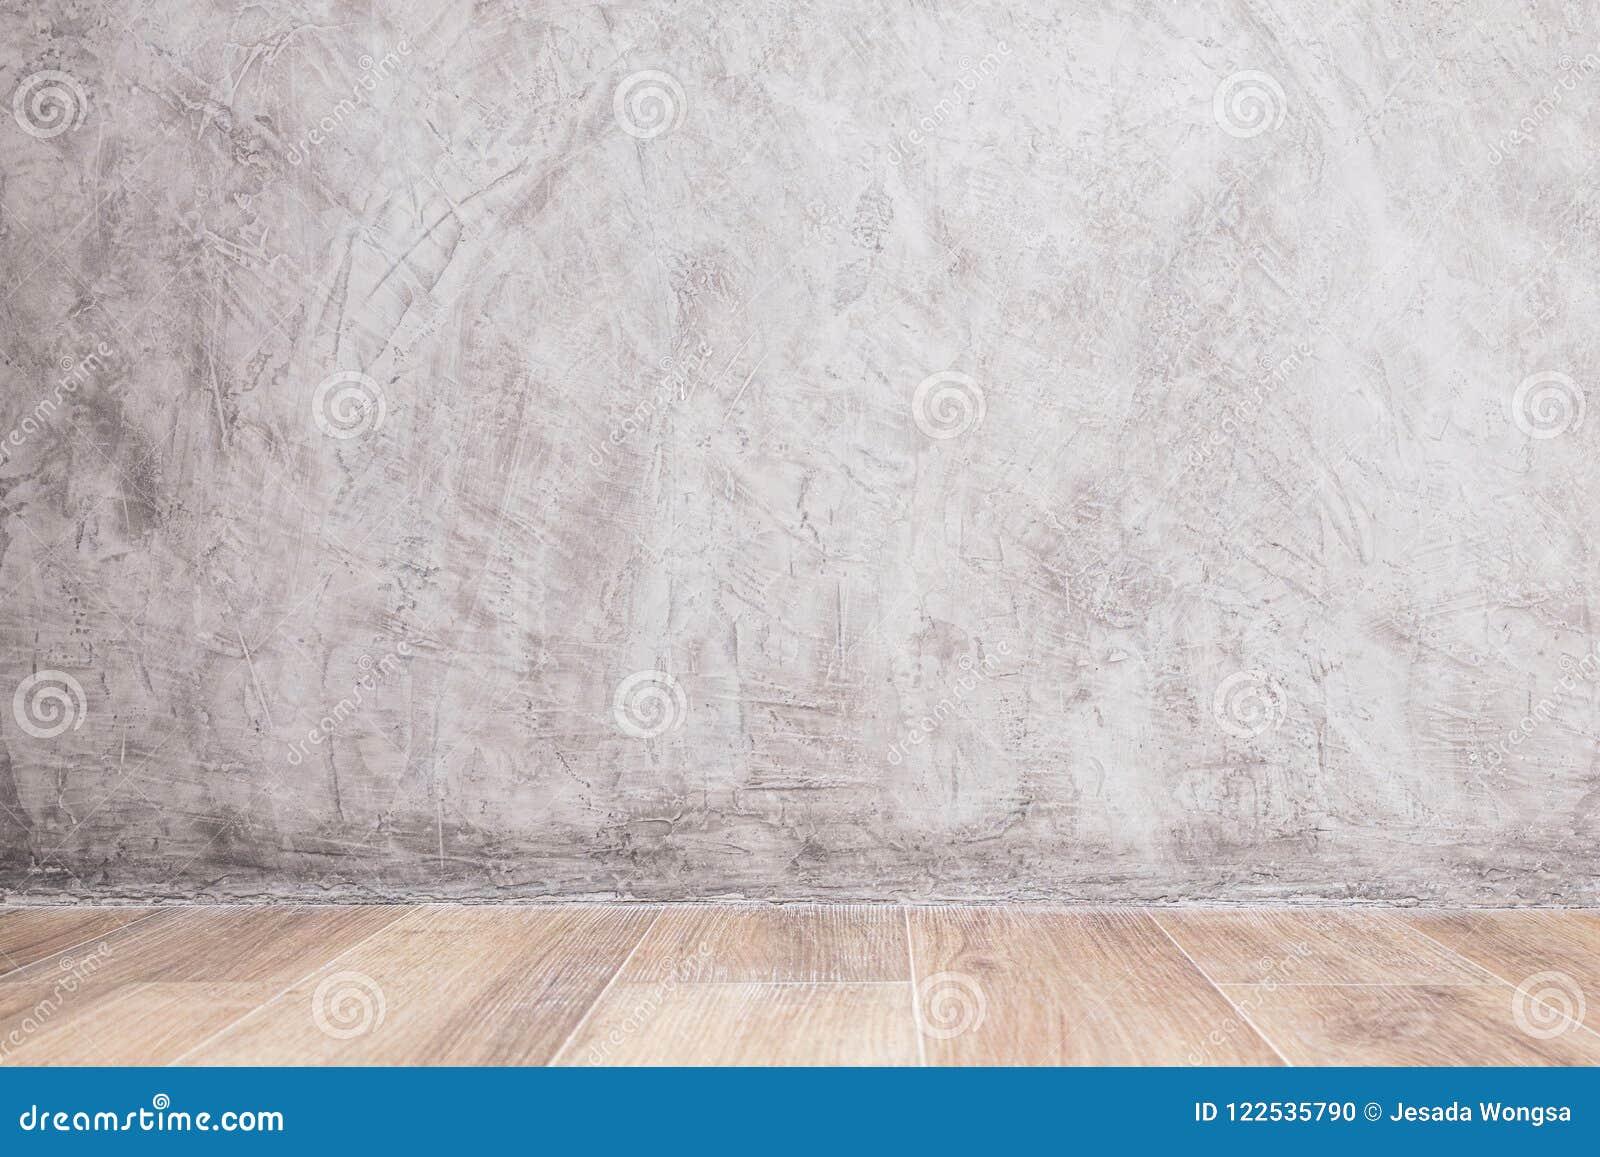 Verf Houten Vloer : Lege binnenlandse ruimte met verf concrete muur en houten vloer